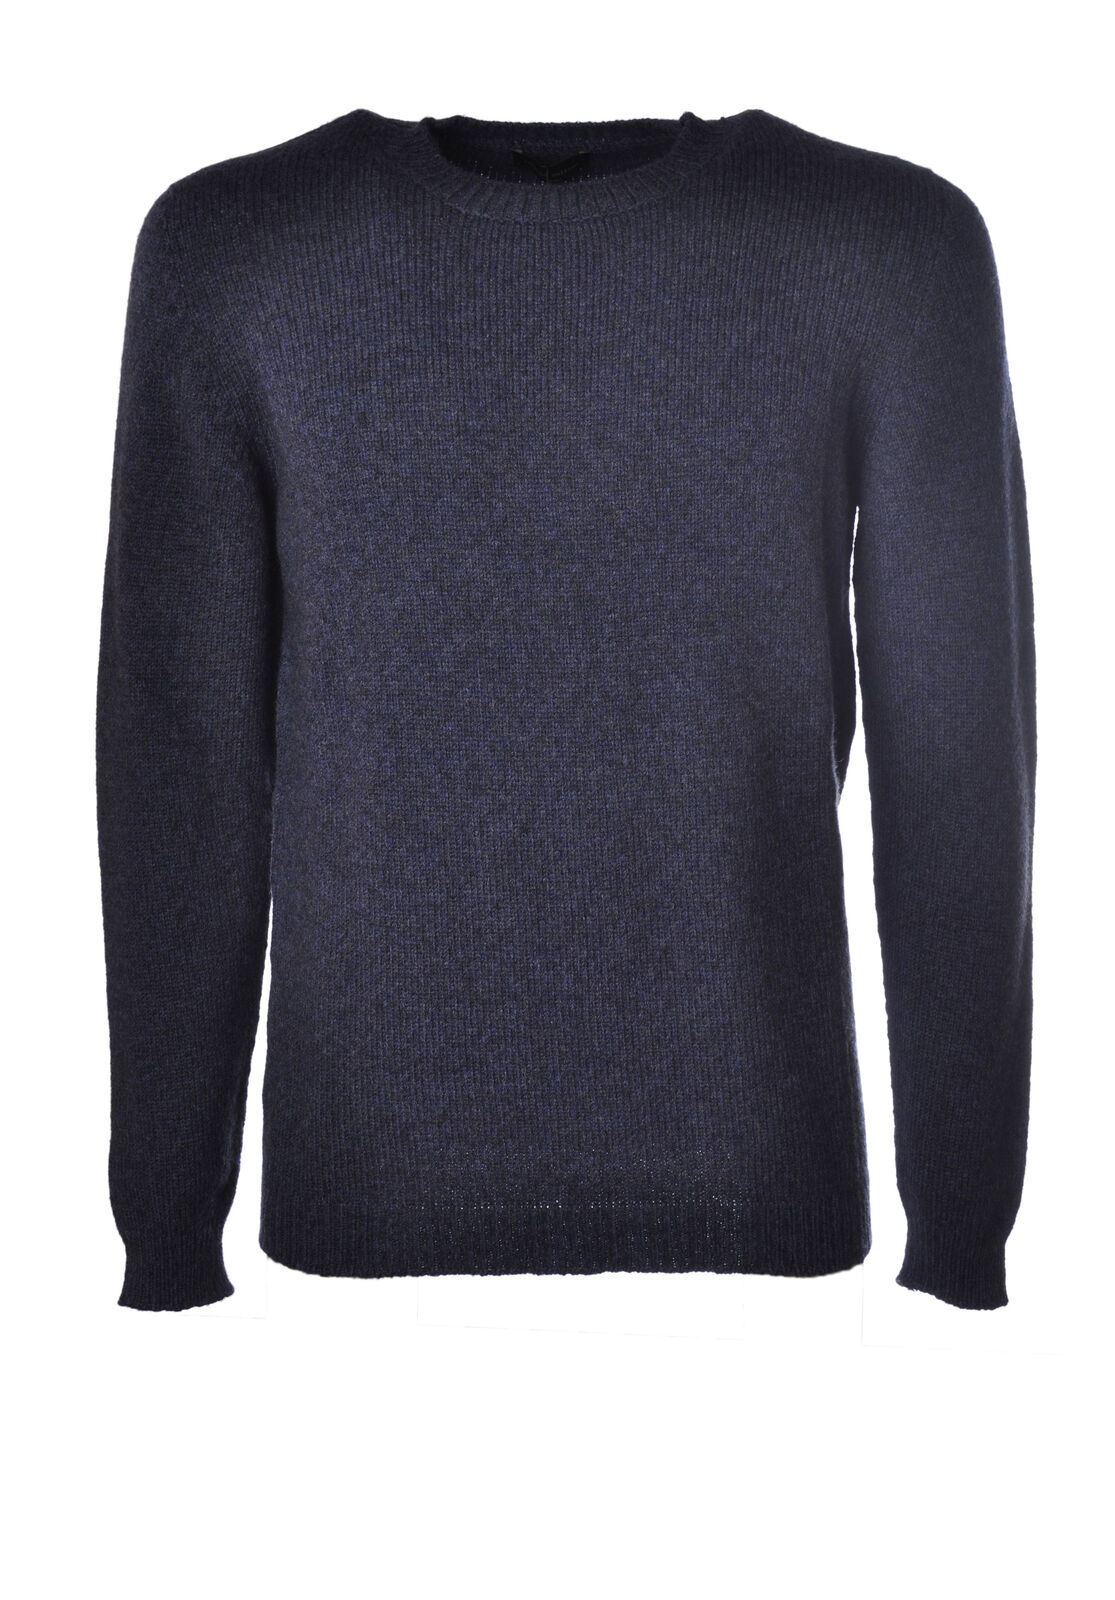 Roberto Collina  -  Sweaters - Male - bluee - 3986531A184417